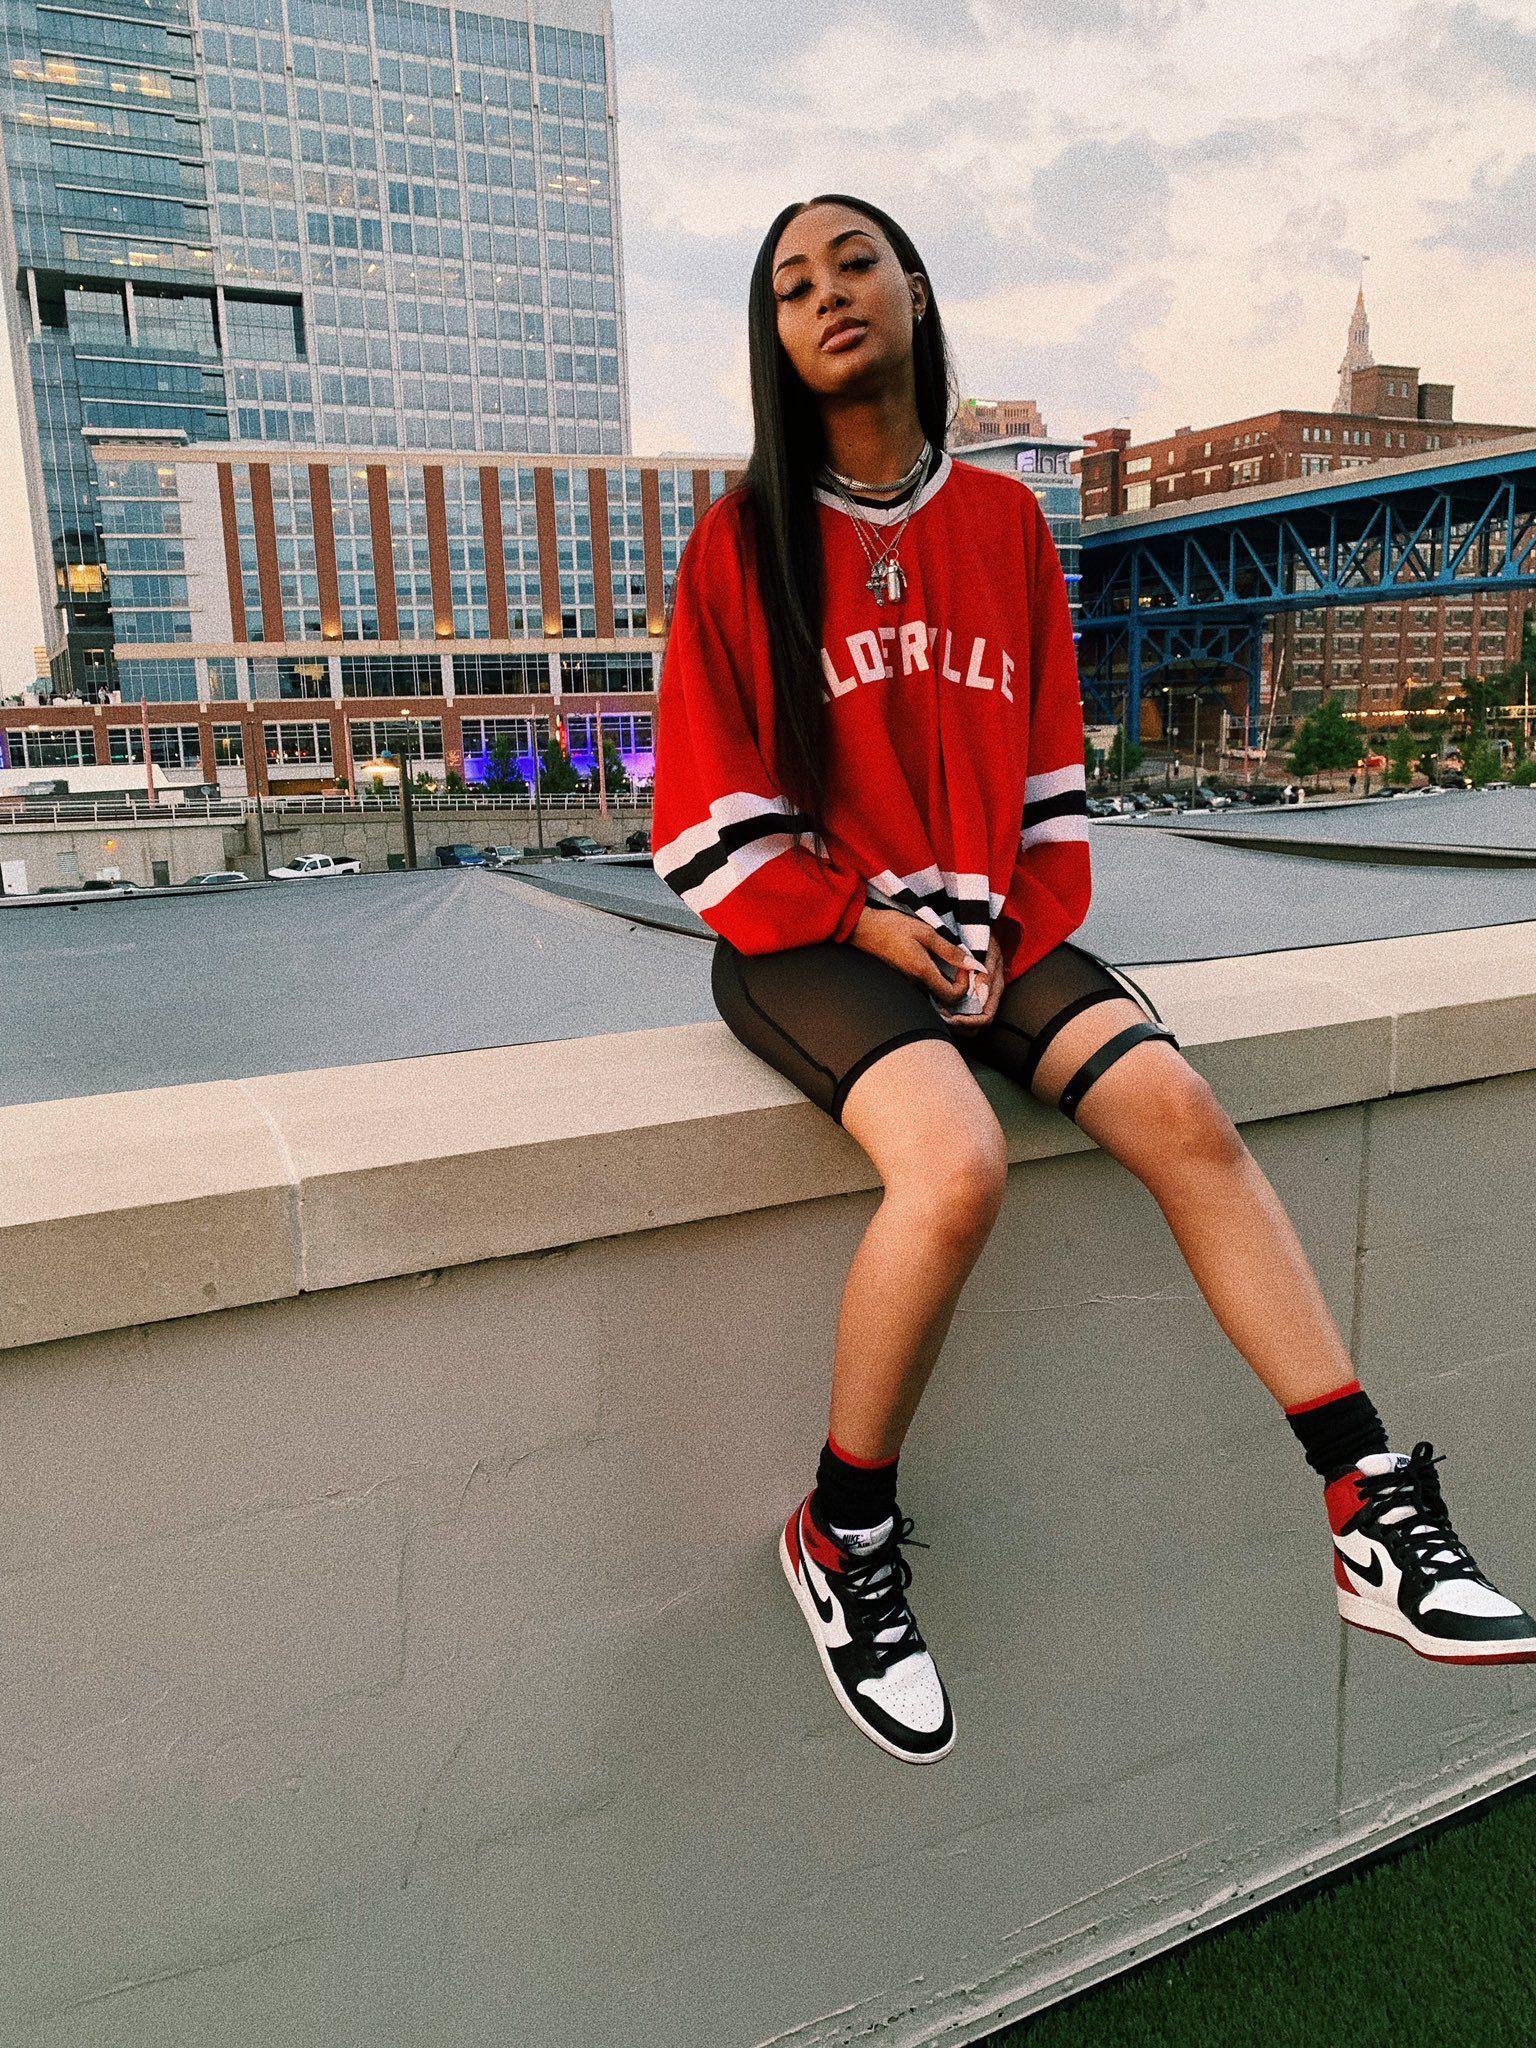 Baddie Outfits With Jordans, Internet meme